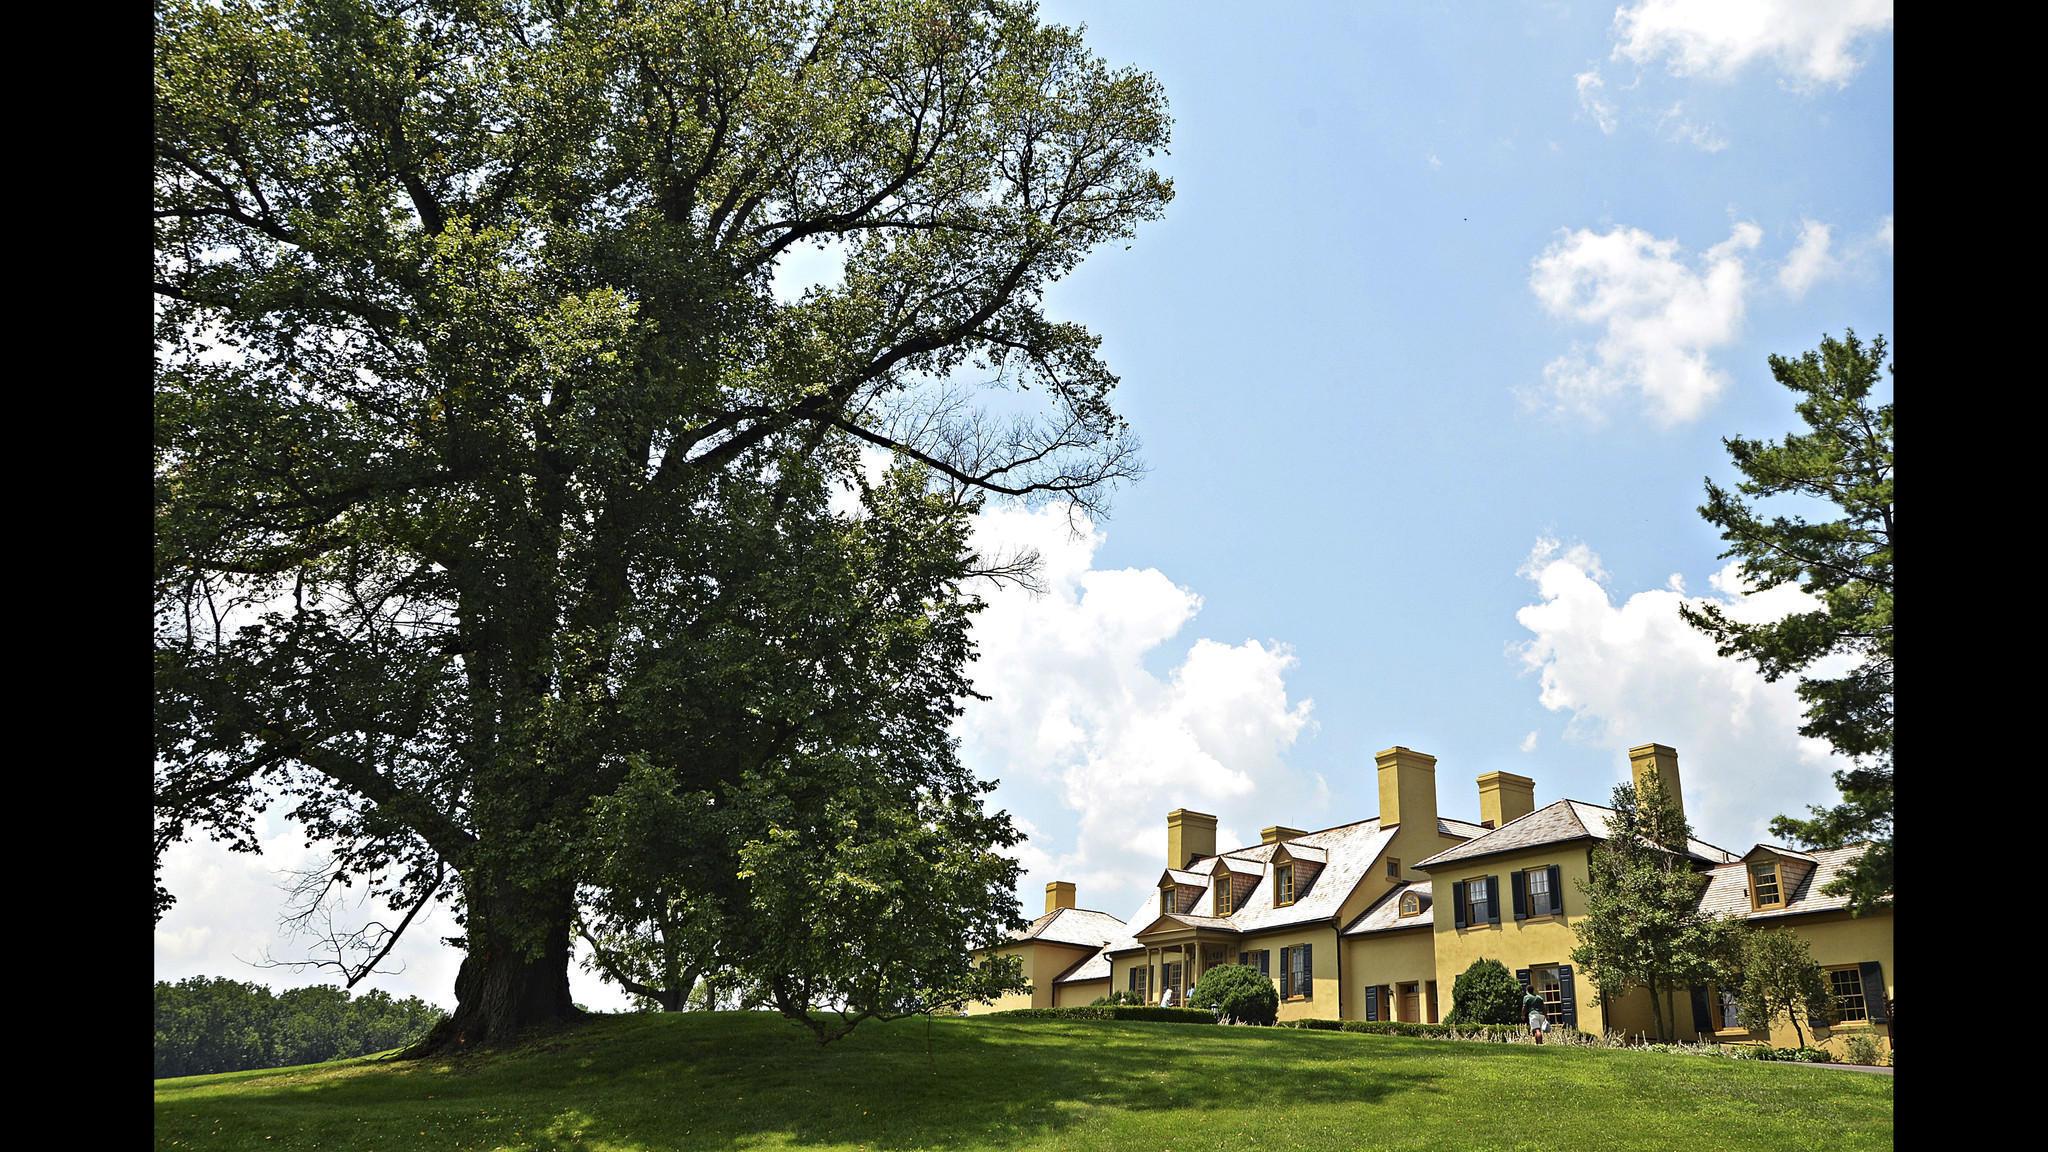 Belmont S Centuries Old Elm Will Be Cut Down Next Week